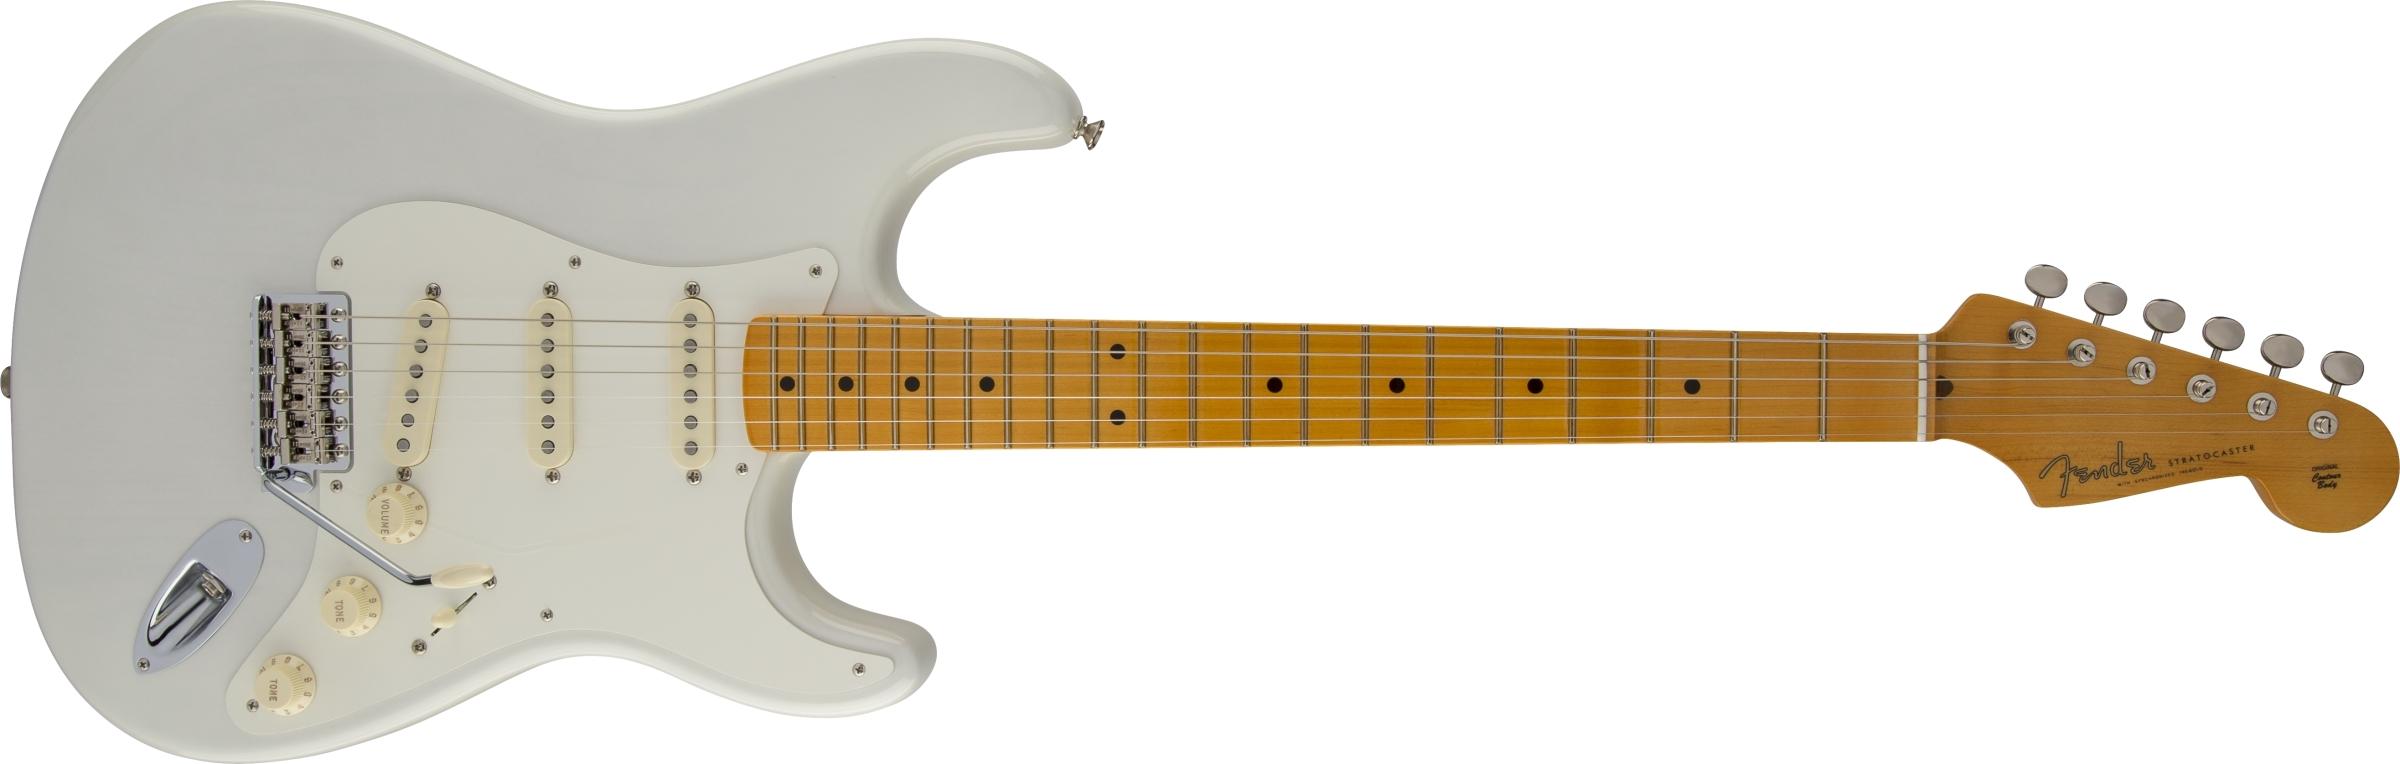 eric johnson stratocaster� maple electric guitars Schecter Guitar Wiring Diagrams